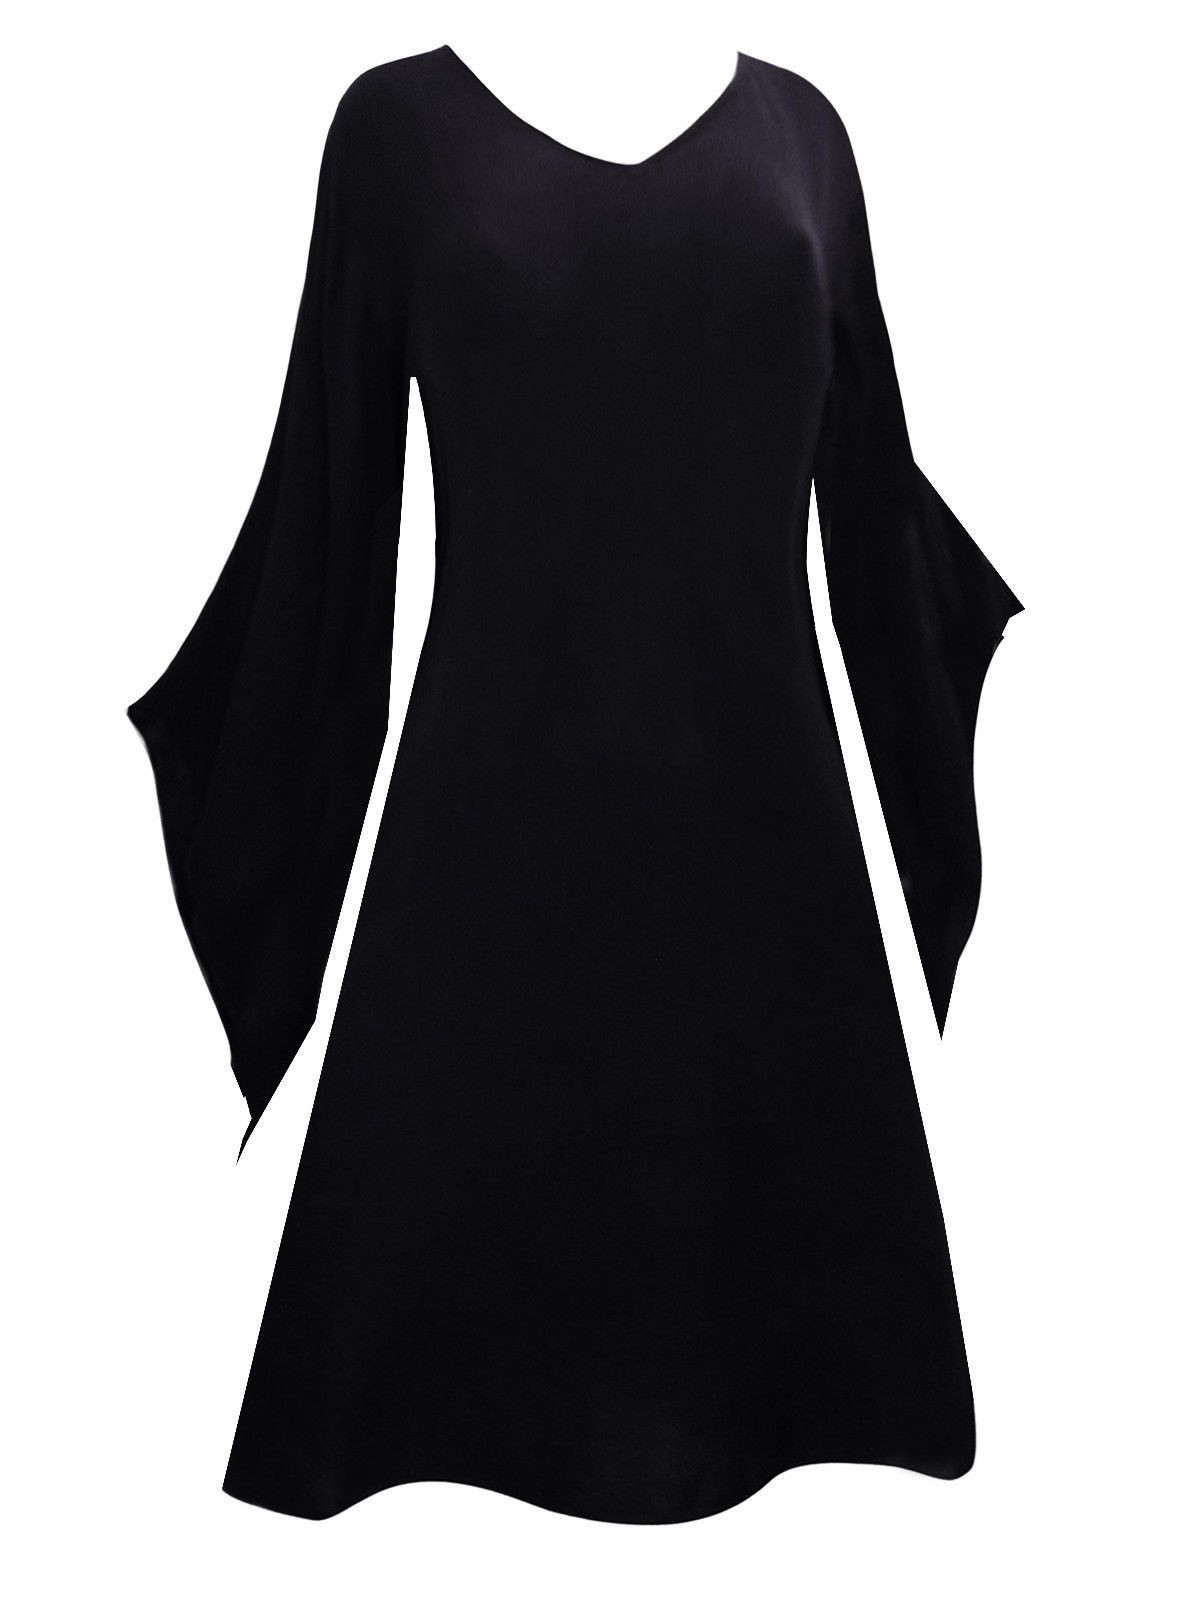 Long black medieval top dress plus